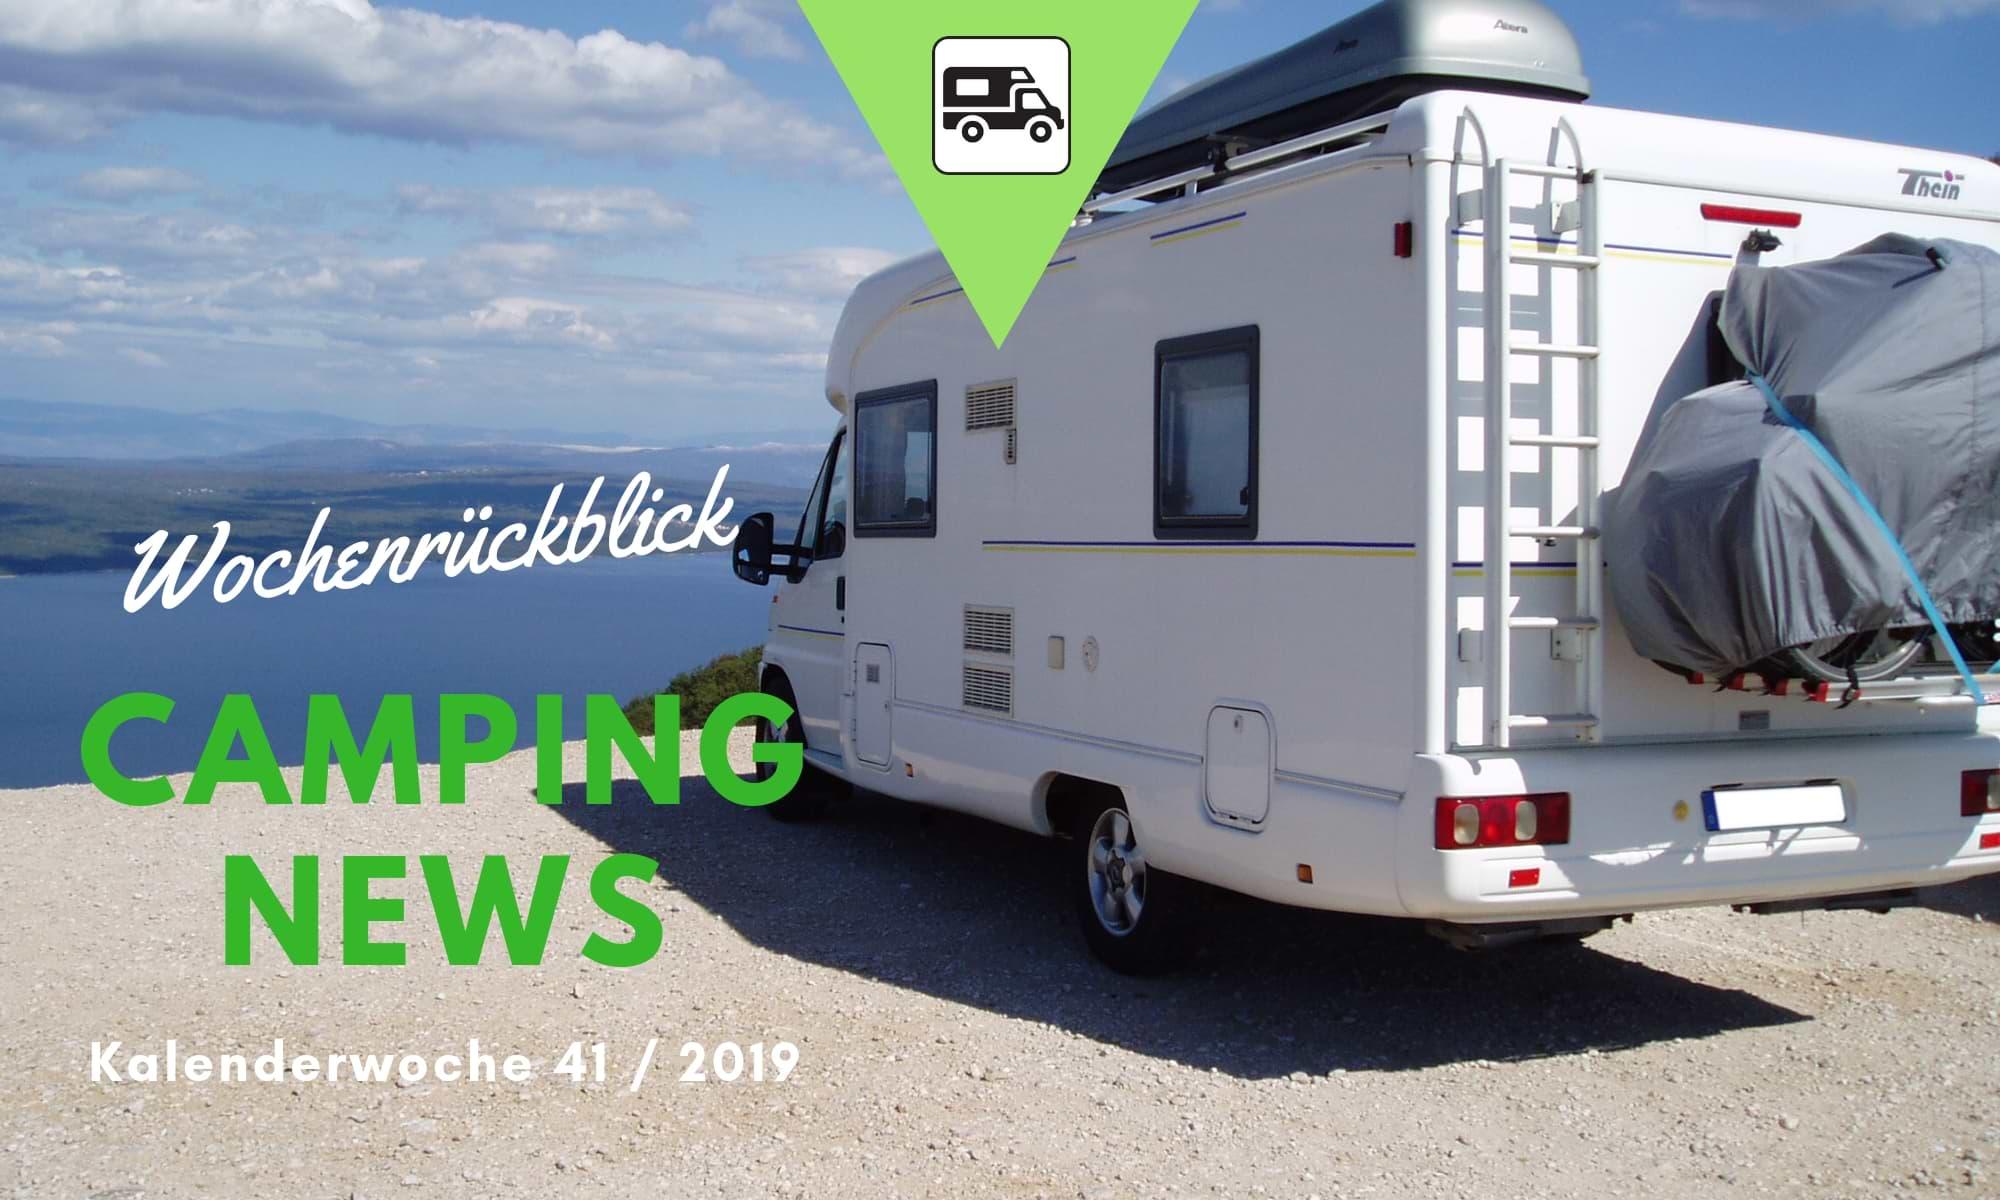 Wochenrückblick Camping News KW41-2019